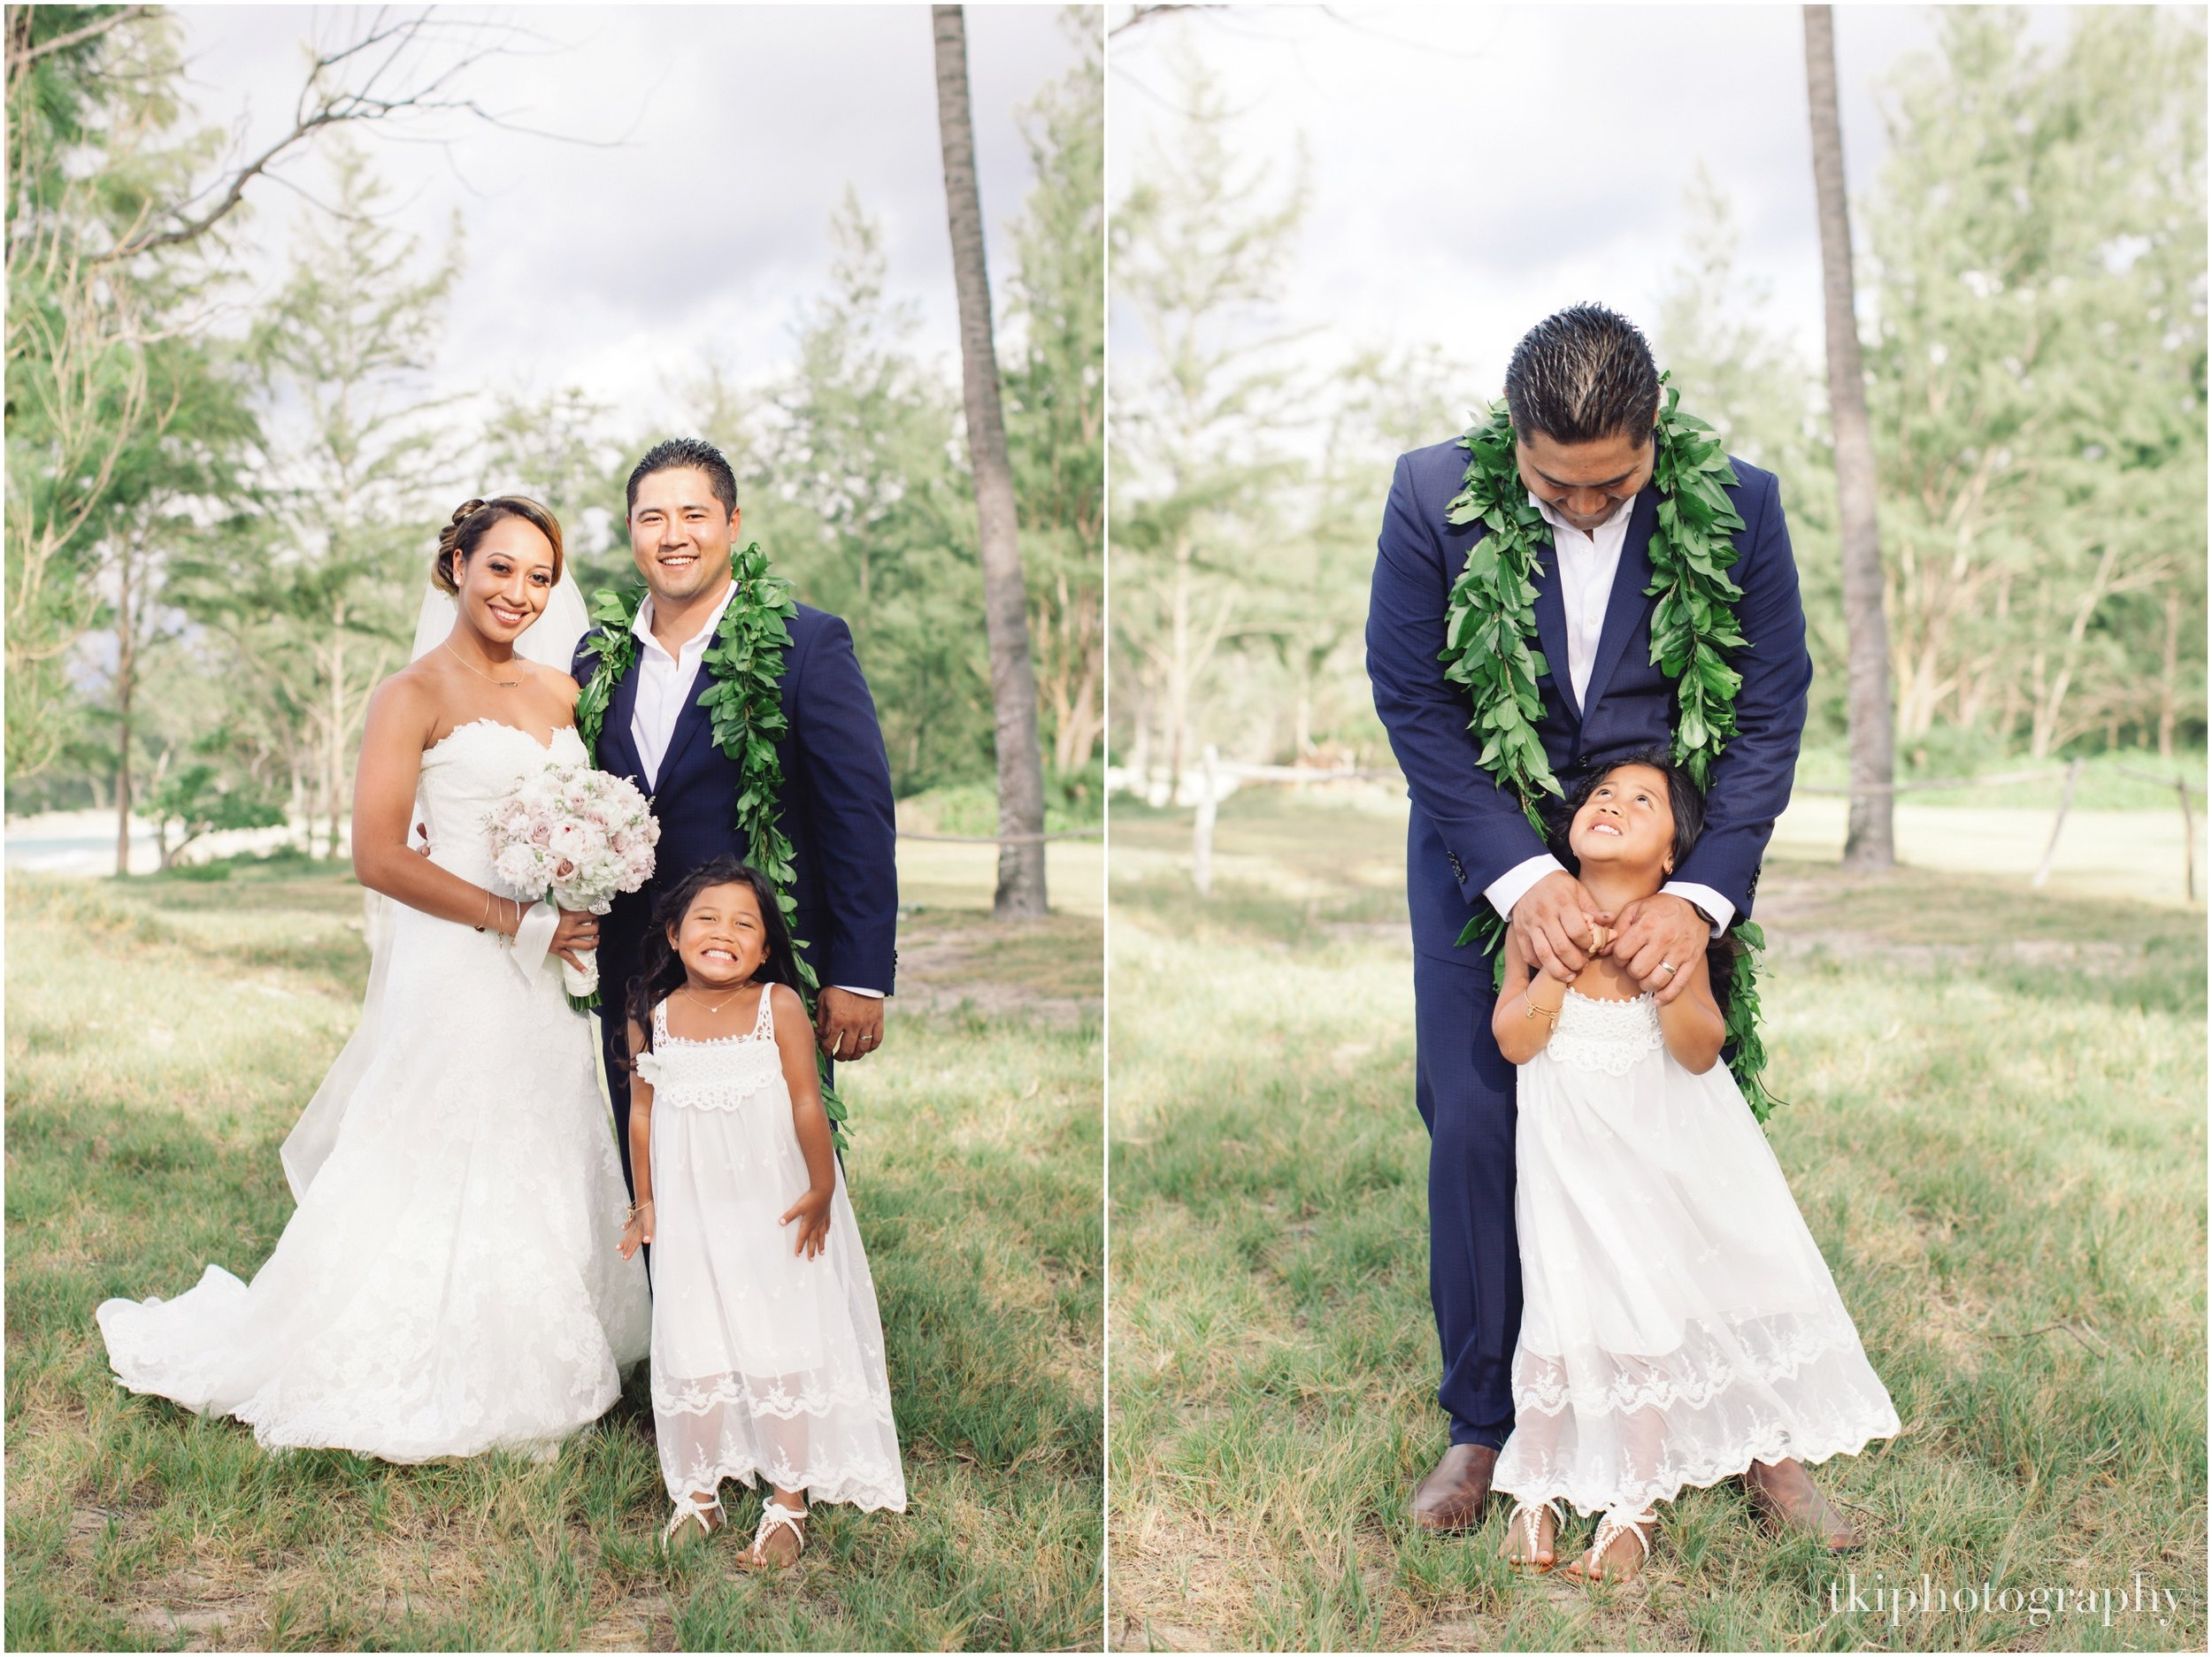 Oahu-Destination-Wedding-Beach_0101.jpg